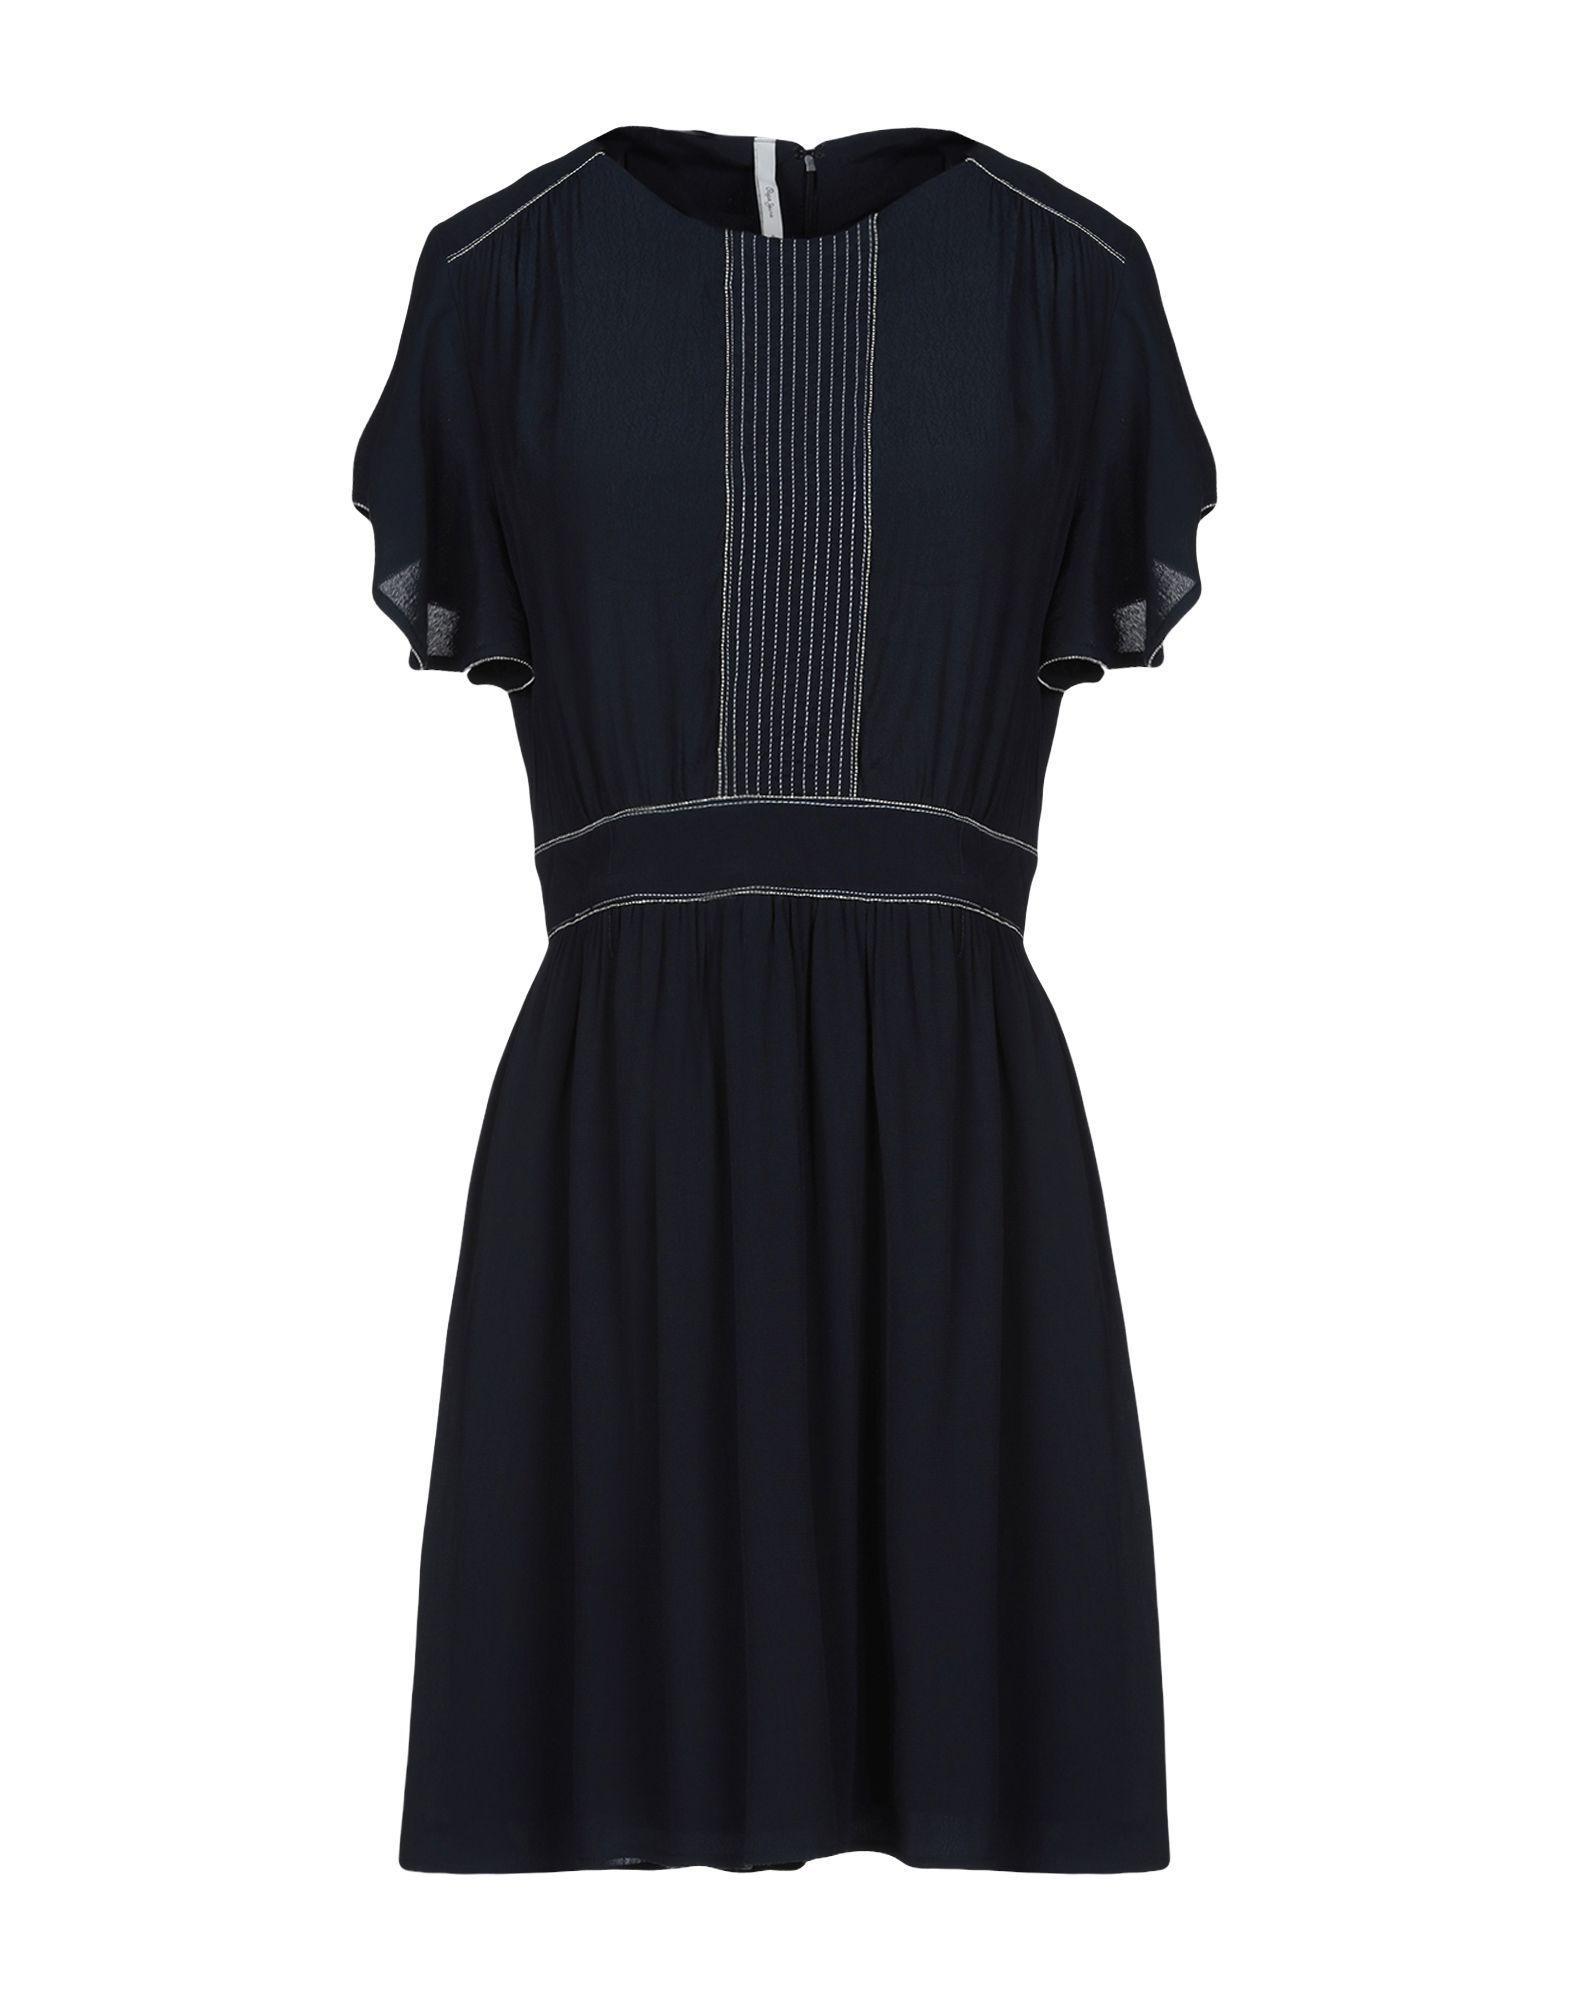 Pepe Jeans Dark Blue Dress